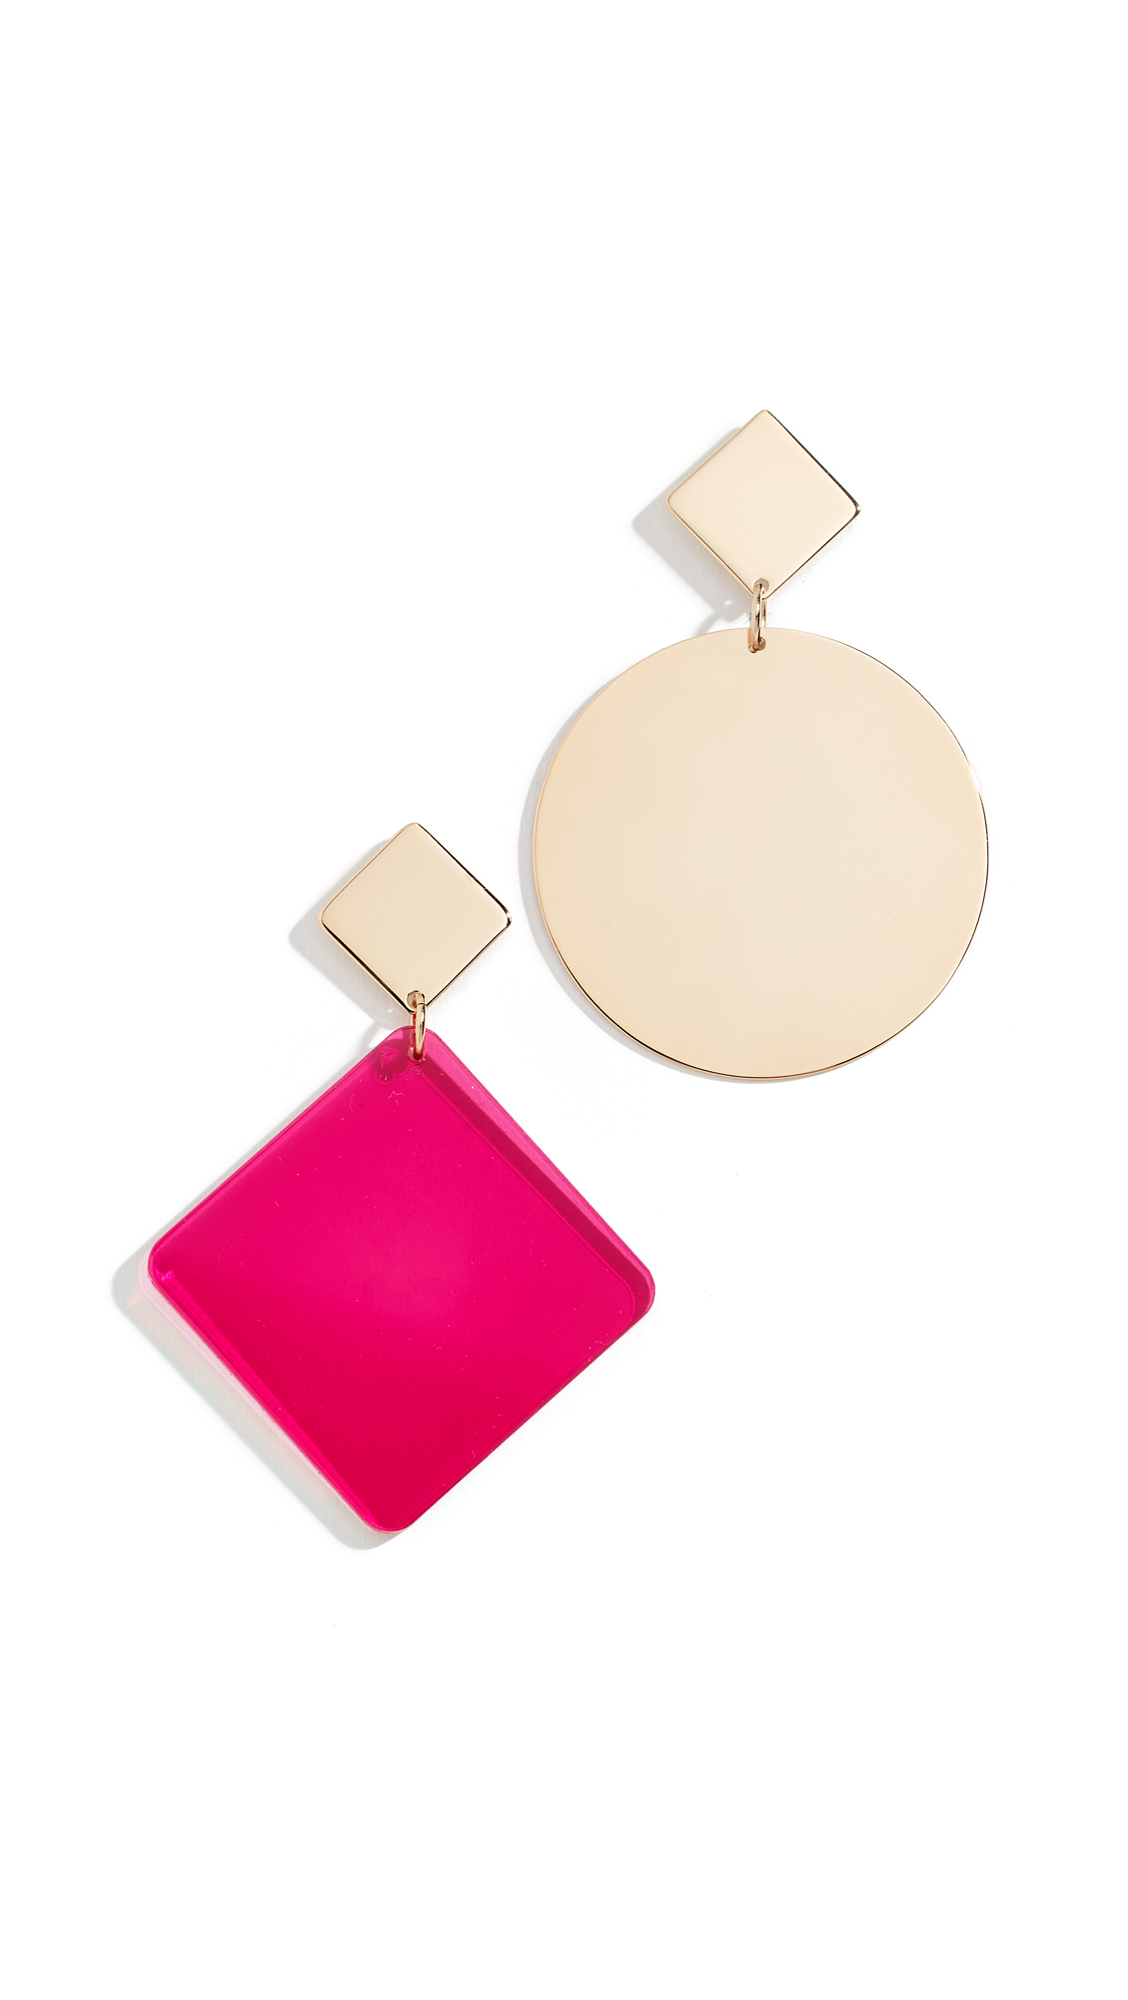 Isabel Marant Boucle Oreill Earrings - Fuchsia